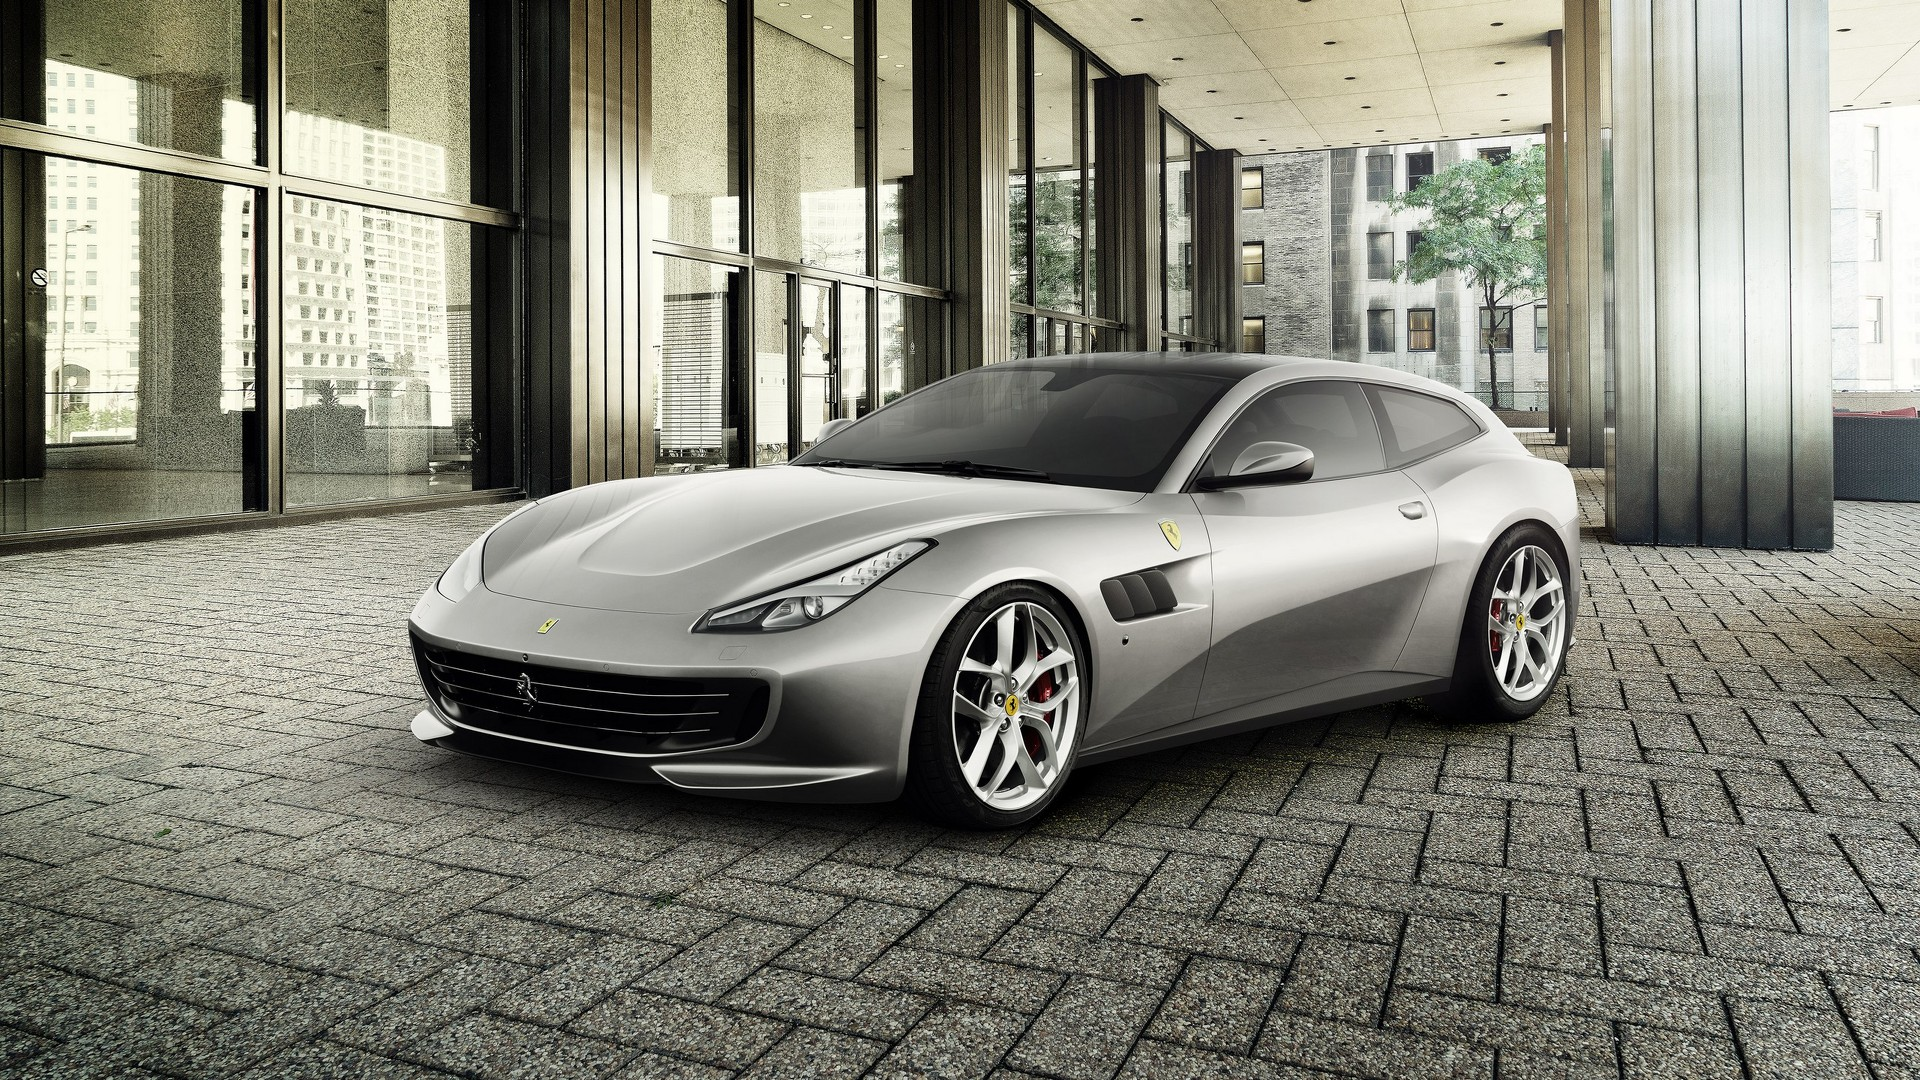 Ferrari отзывает машины из-за риска возгорания и дефекта дверей 1